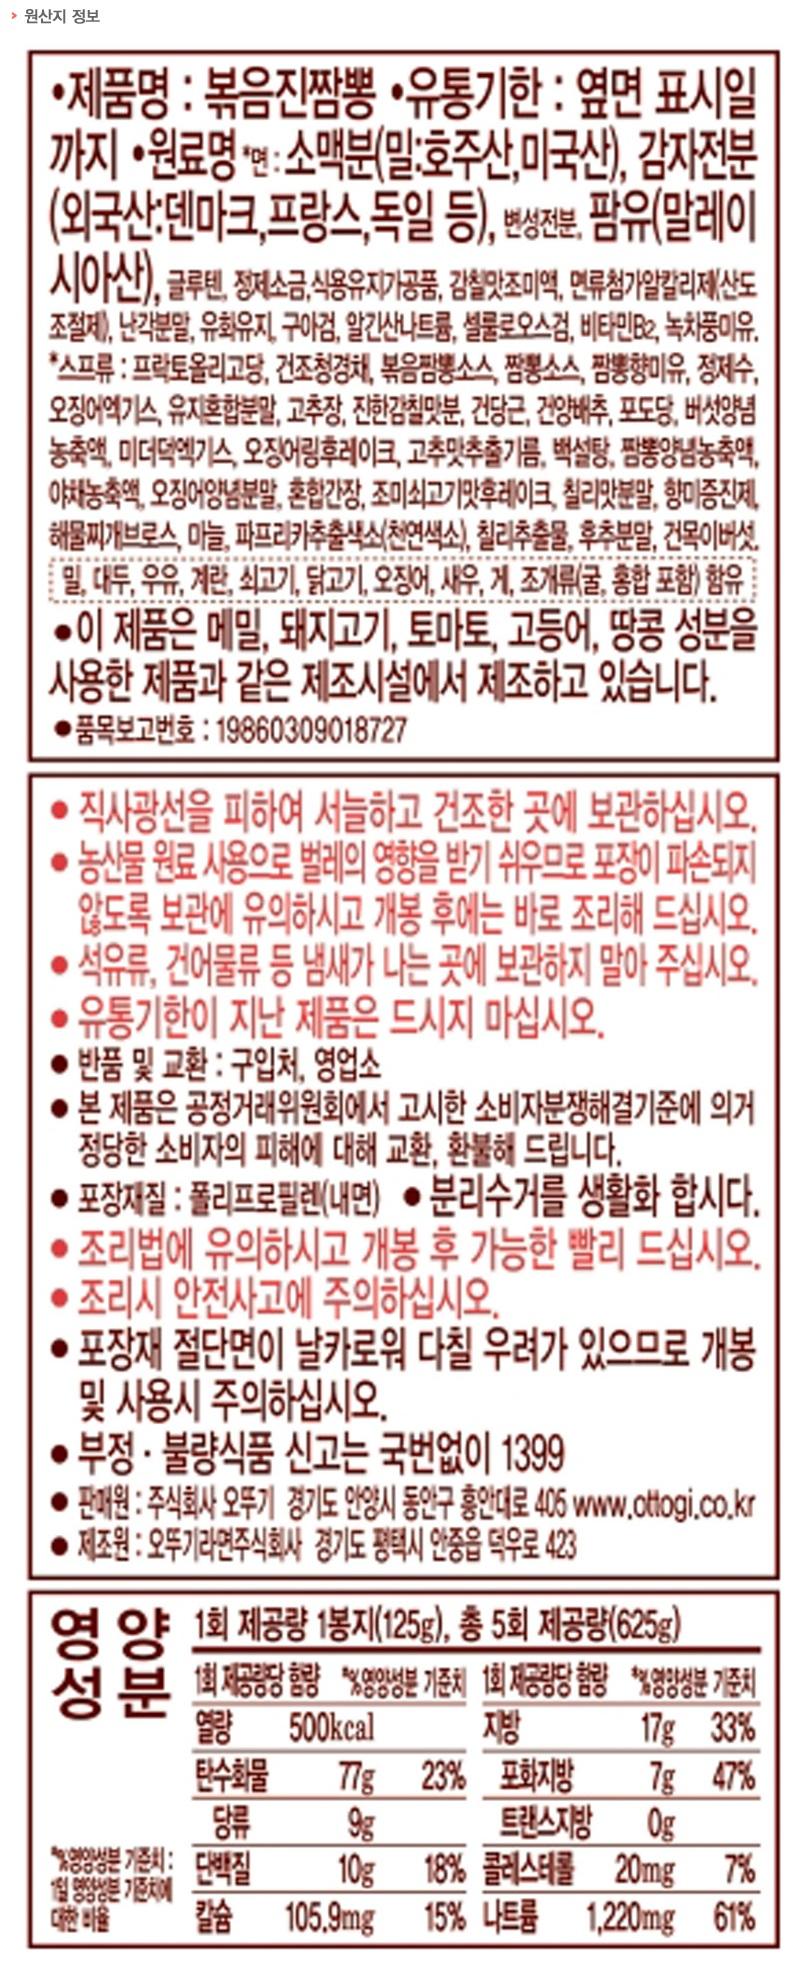 [ NongShim ] [盒] Saut-Jin-炒马面拉面(4)+1 1框